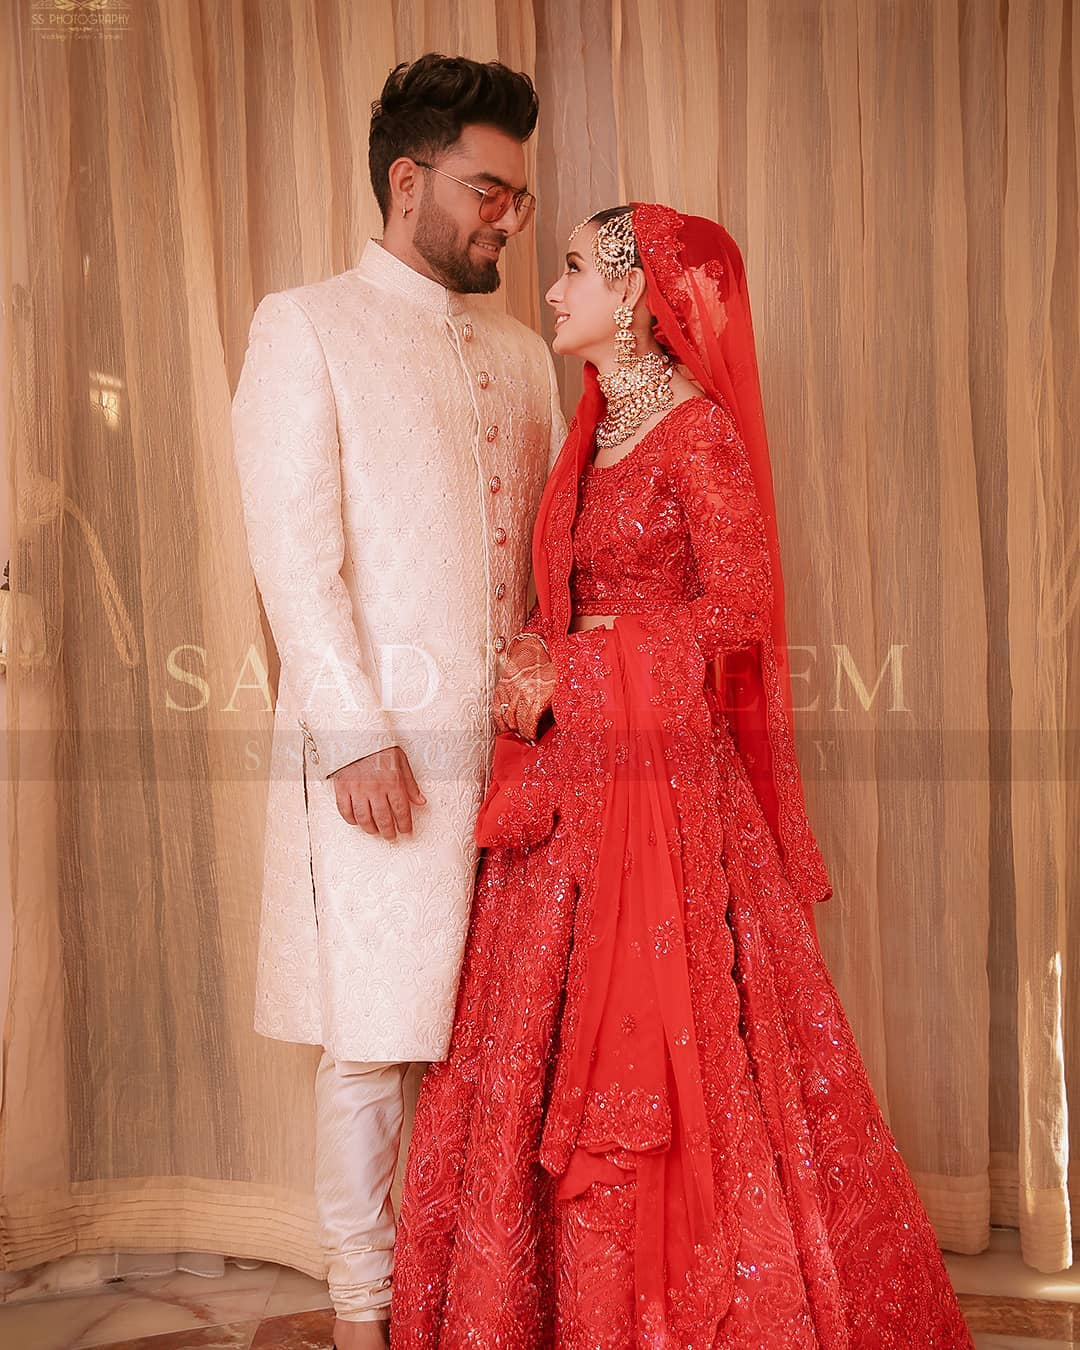 Iqra Aziz and Yasir Hussain Wedding Pictures (25)